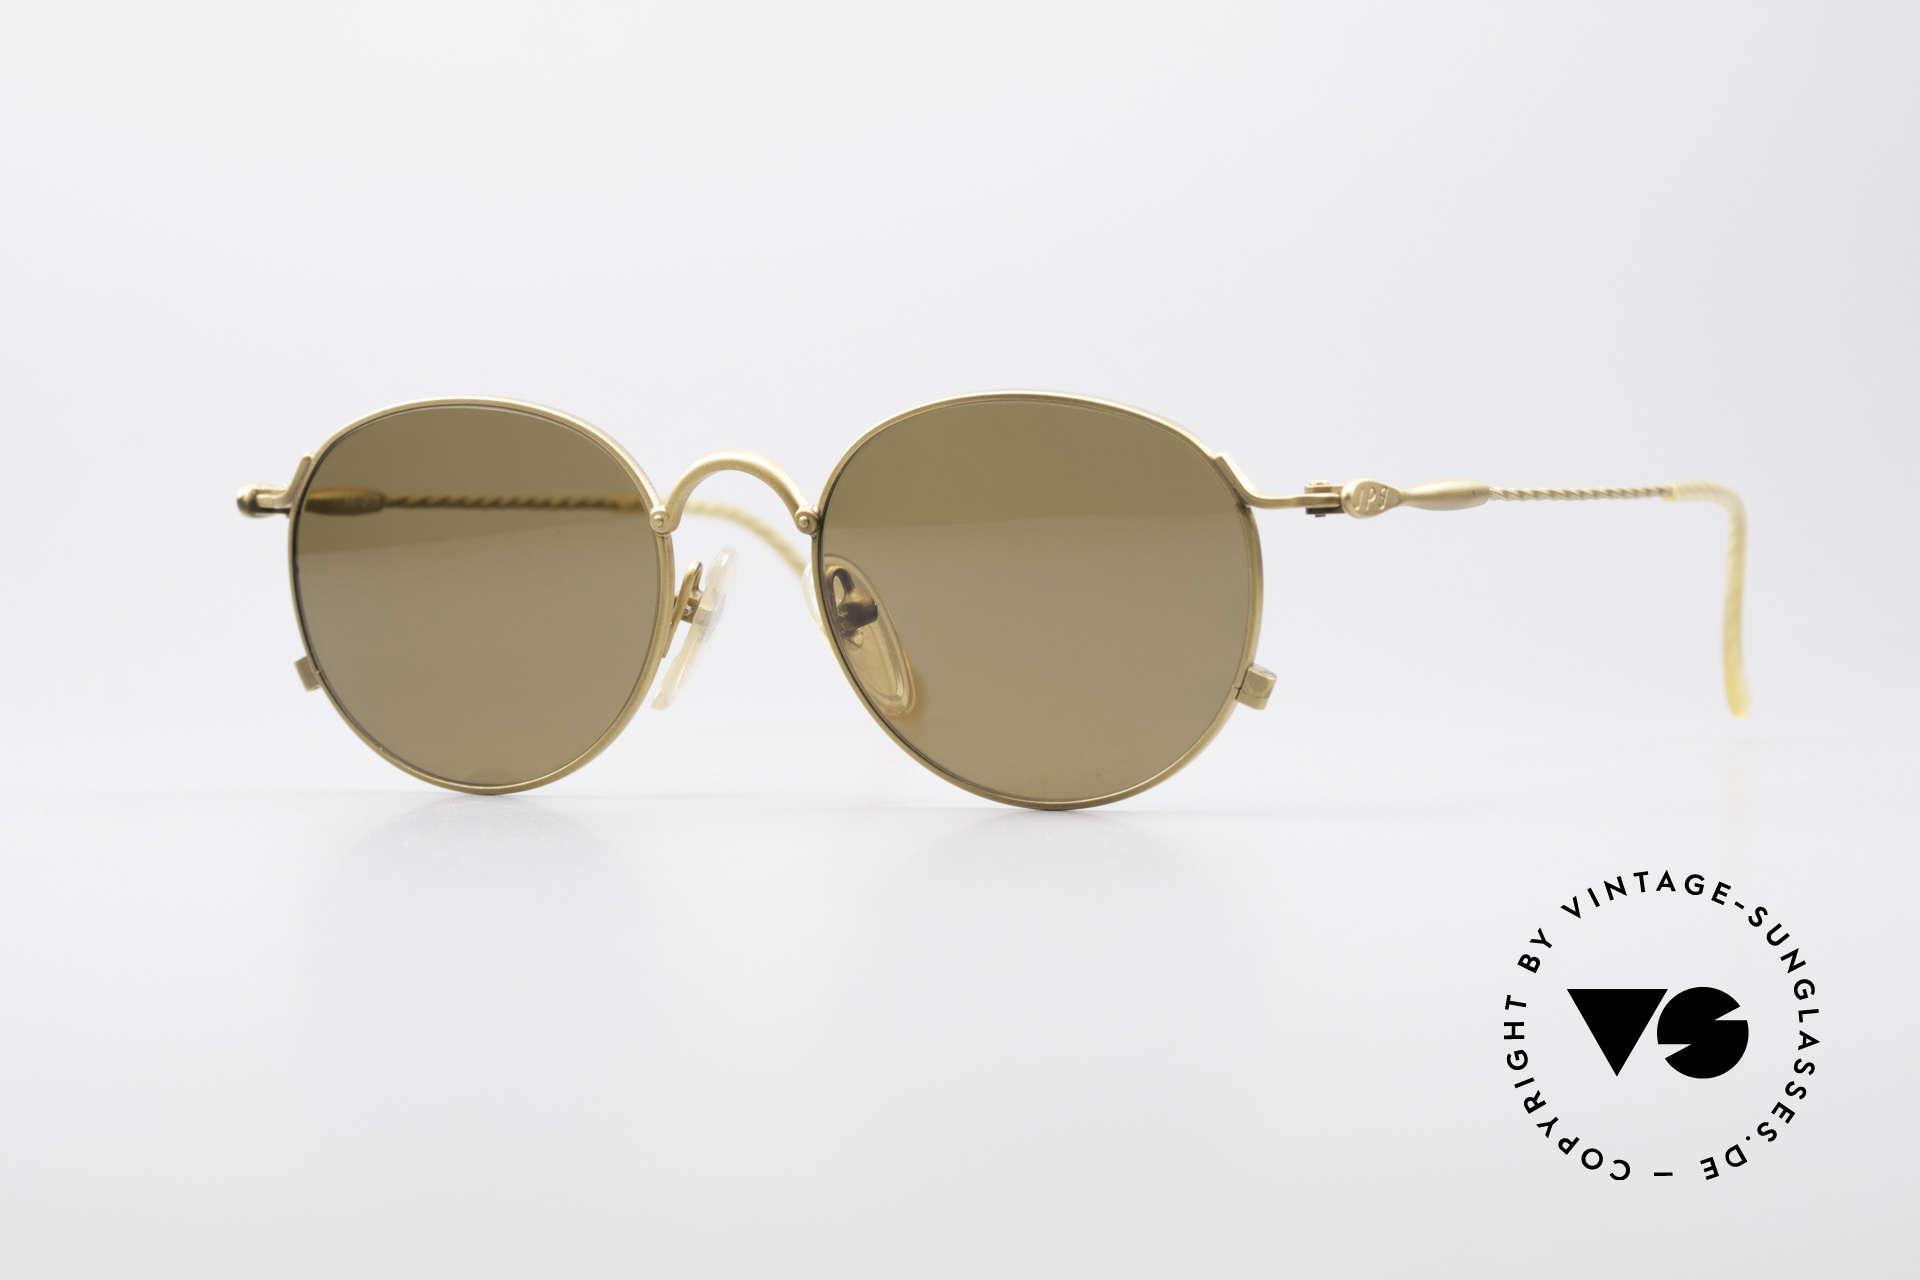 Jean Paul Gaultier 55-2172 Vintage Round JPG Sunglasses, round 90's vintage sunglasses by J.P. Gaultier, Made for Men and Women